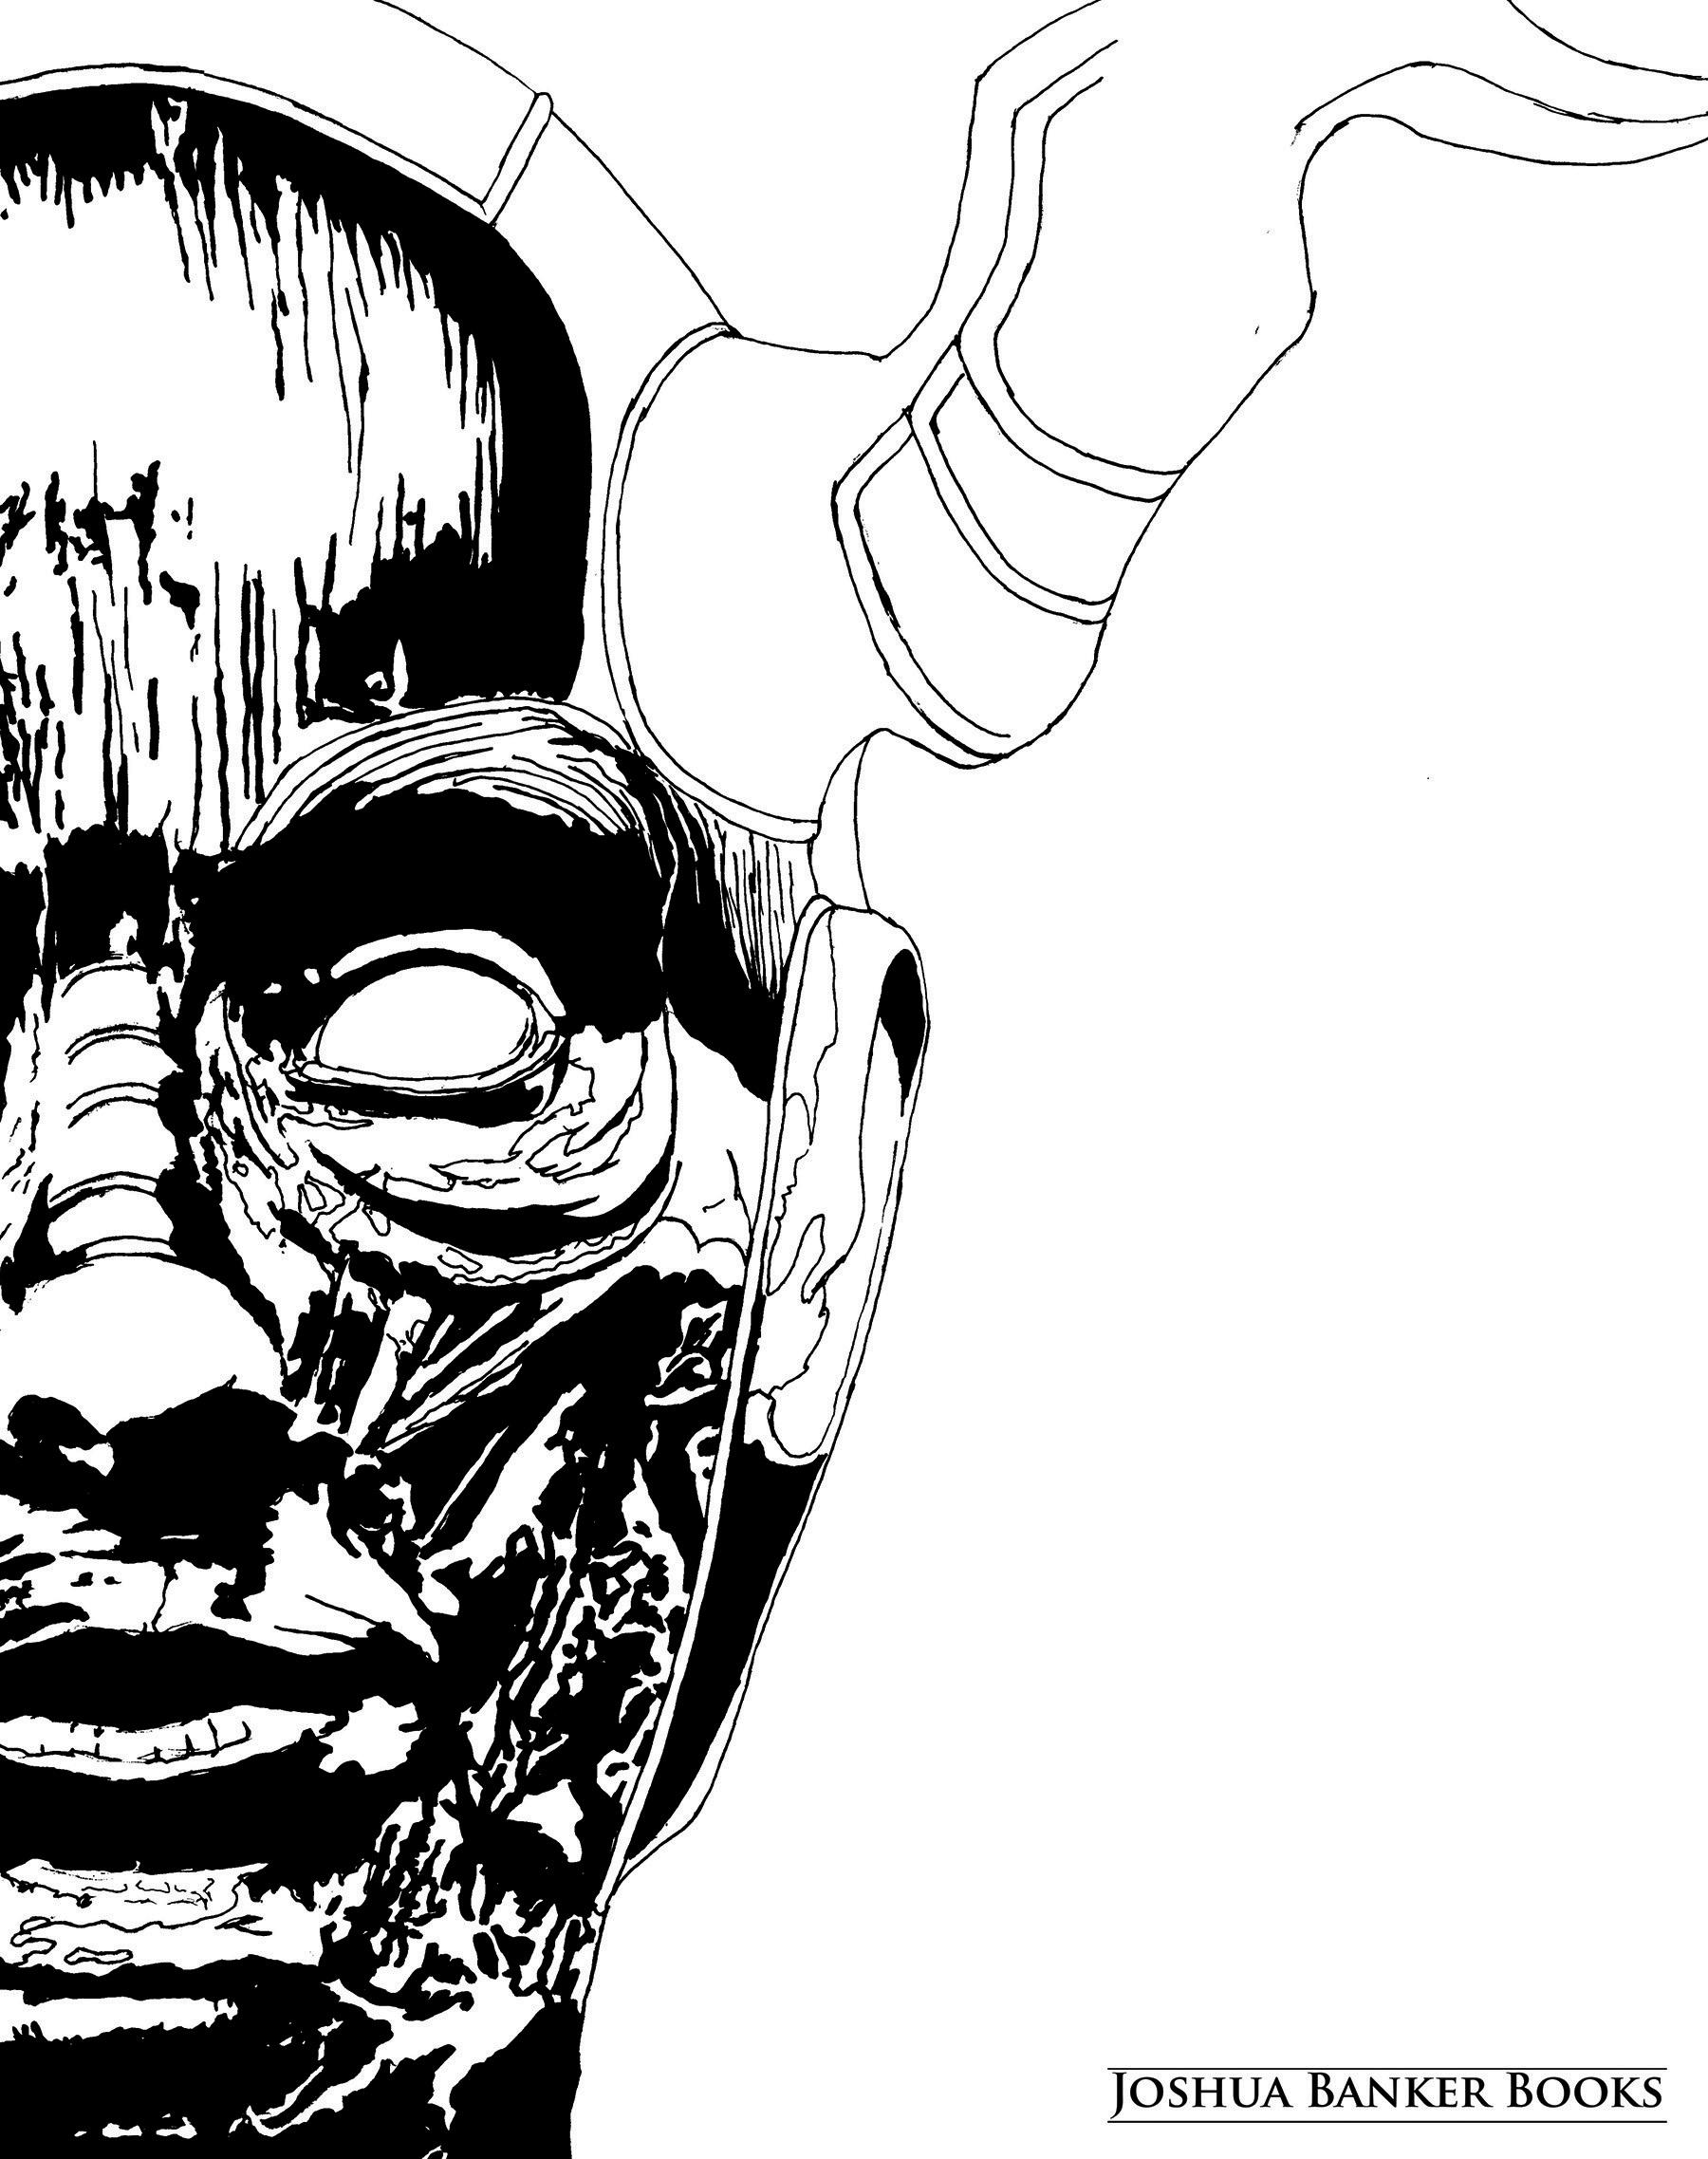 The FIfth Era of Man Illustration